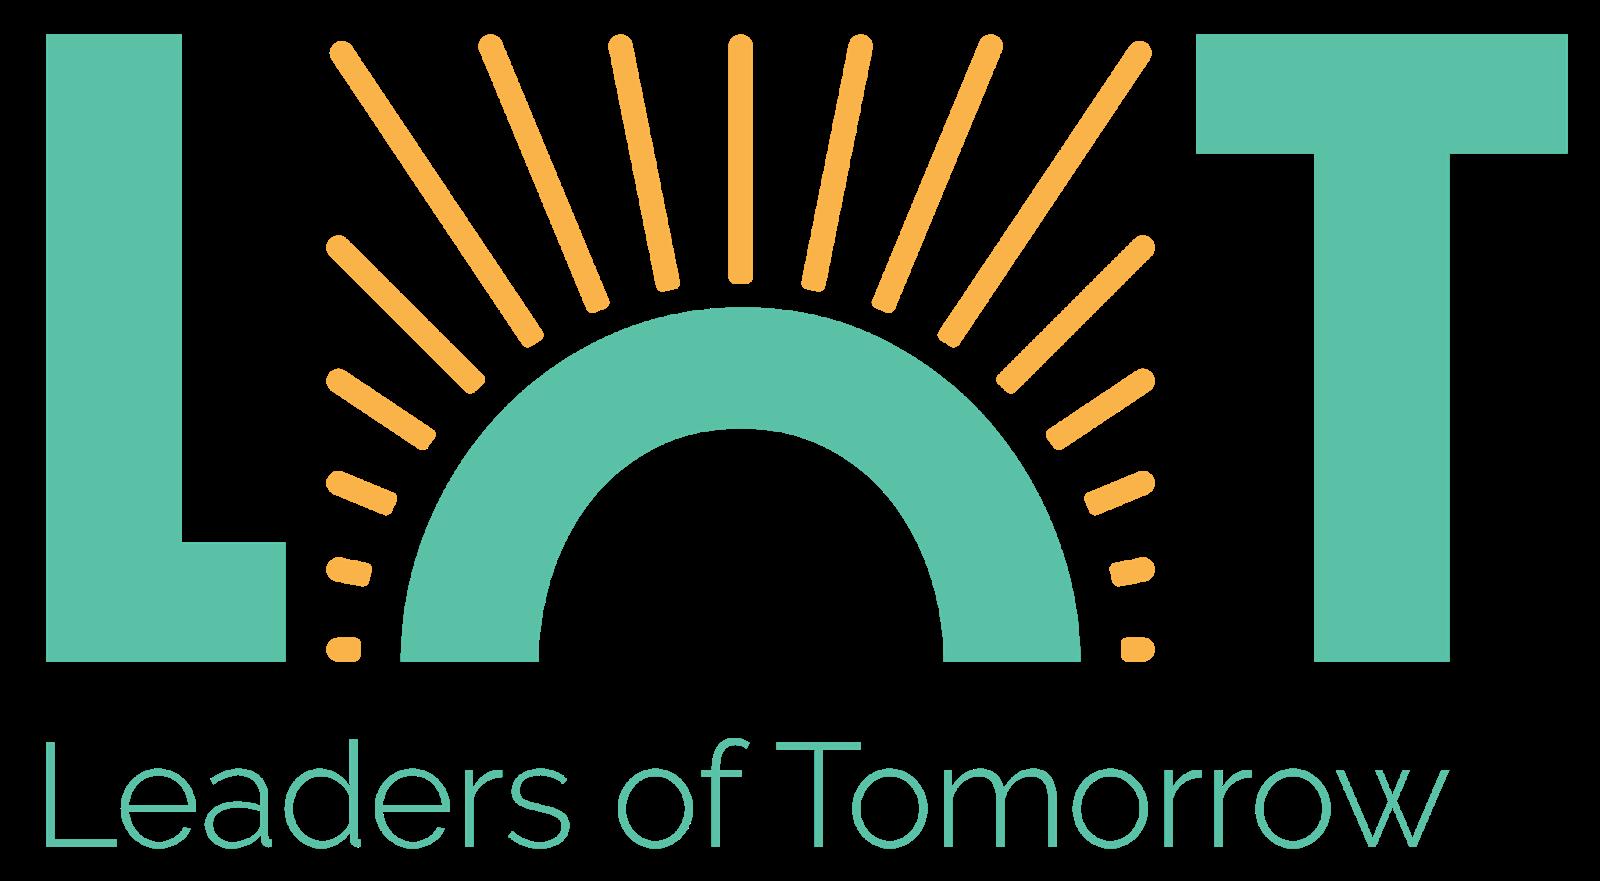 Leaders of Tomorrow Exchange Program 2019 - Scholarship Info